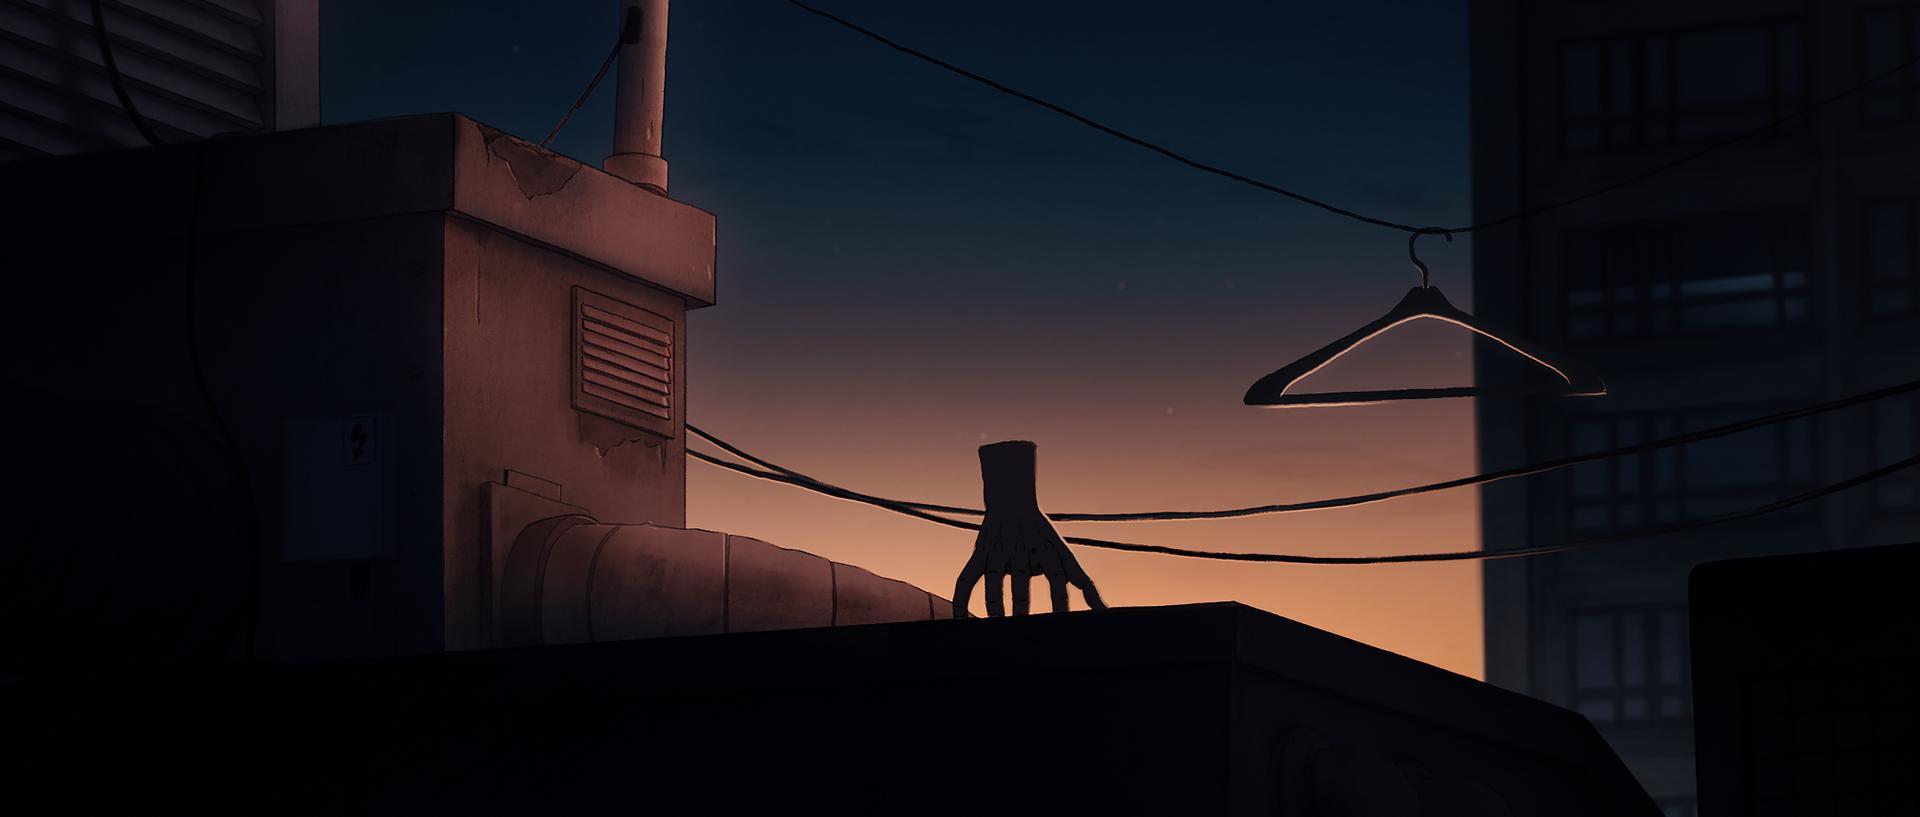 Netflix Adds Aardman's 'A Shaun the Sheep Movie: Farmageddon' to Animation Slate — Exclusive